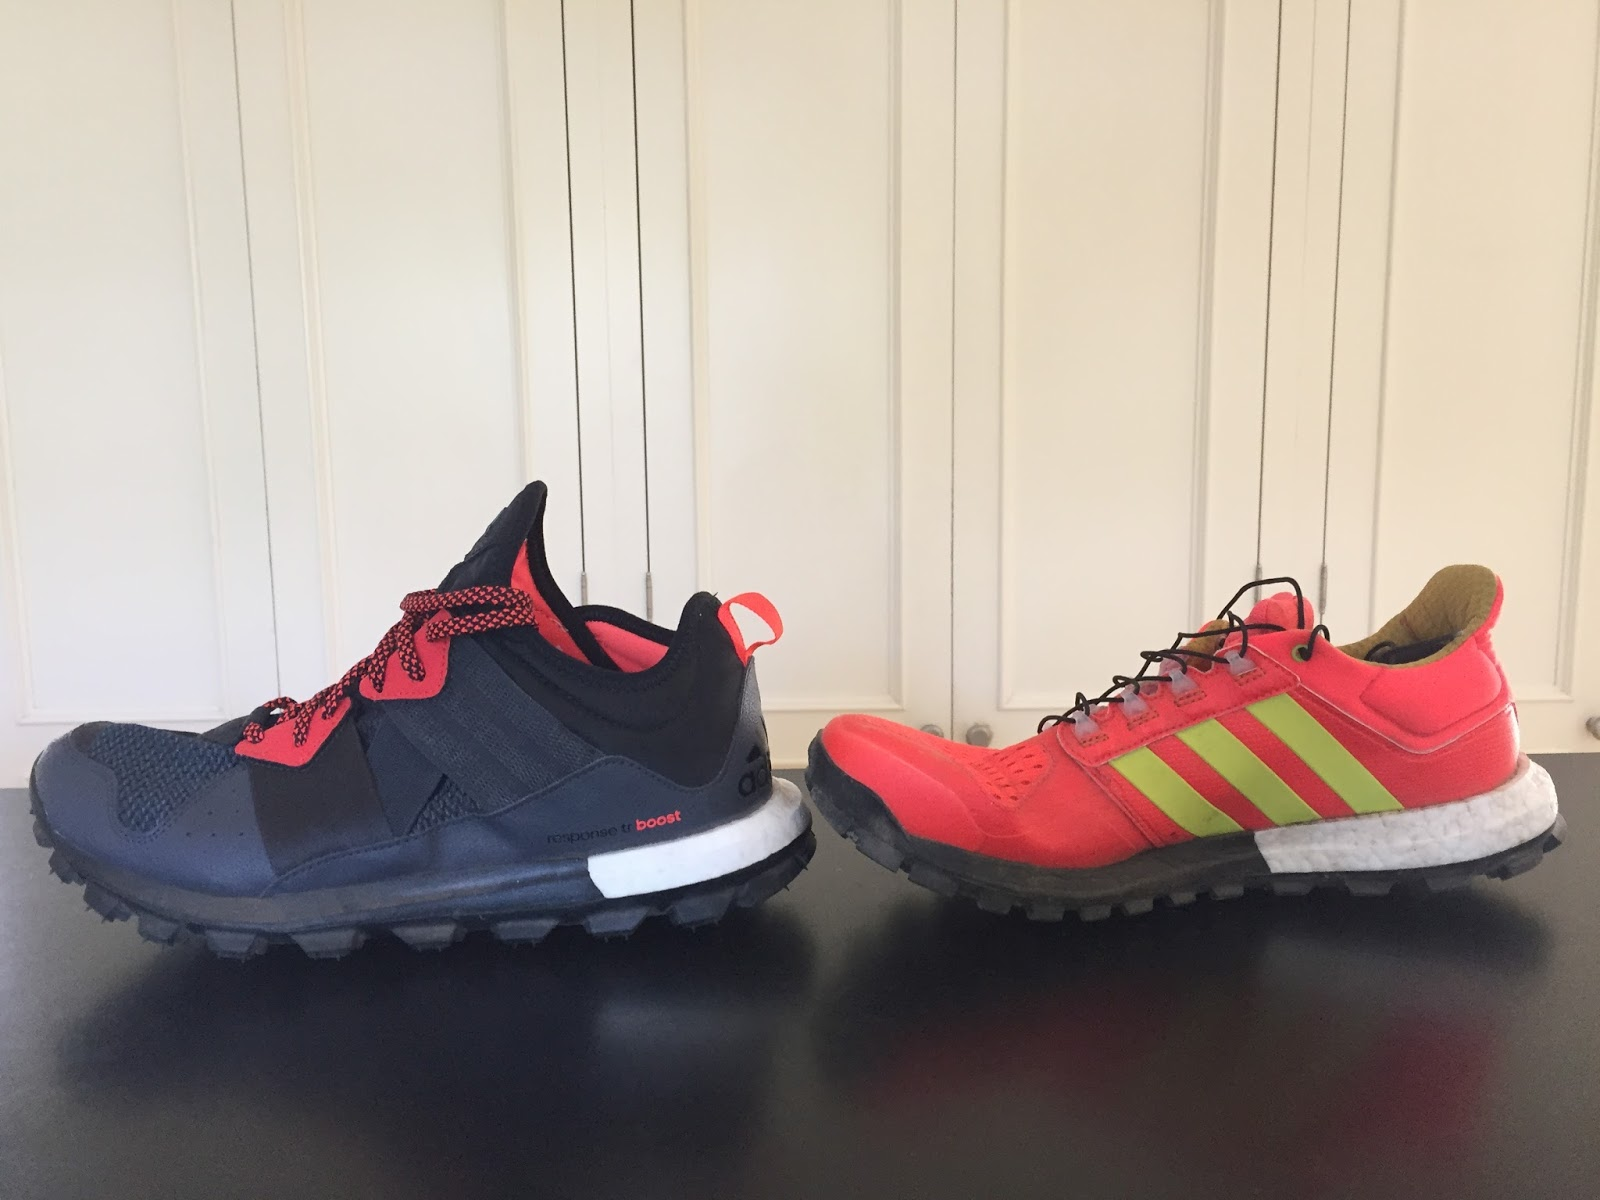 Adidas Boost Response Tr